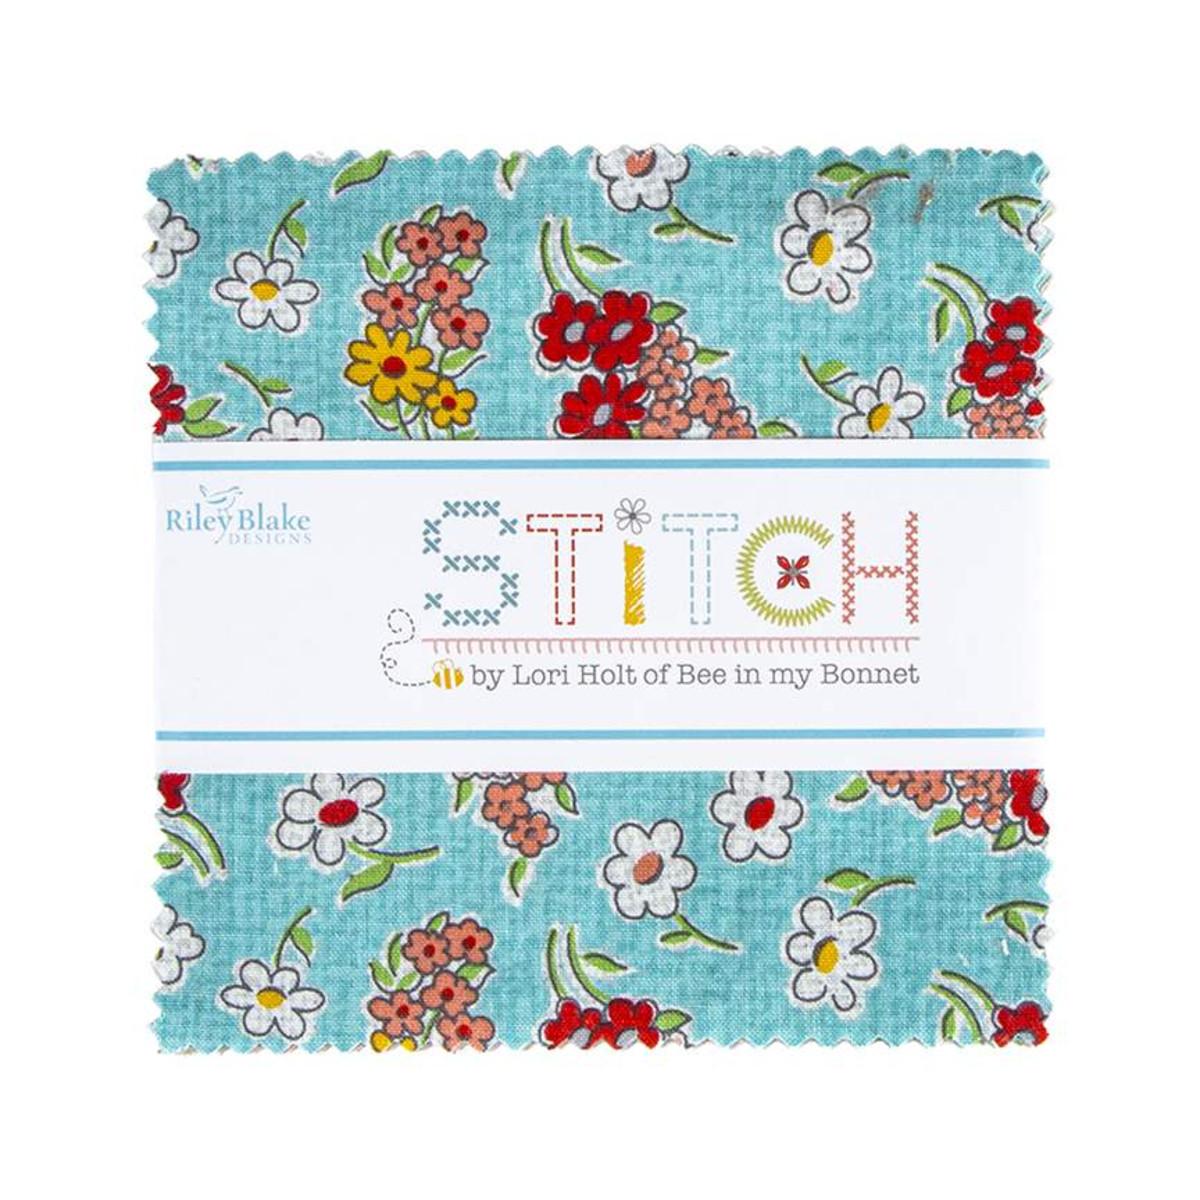 Riley Blake Charm Pack - Stitch by Lori Holt